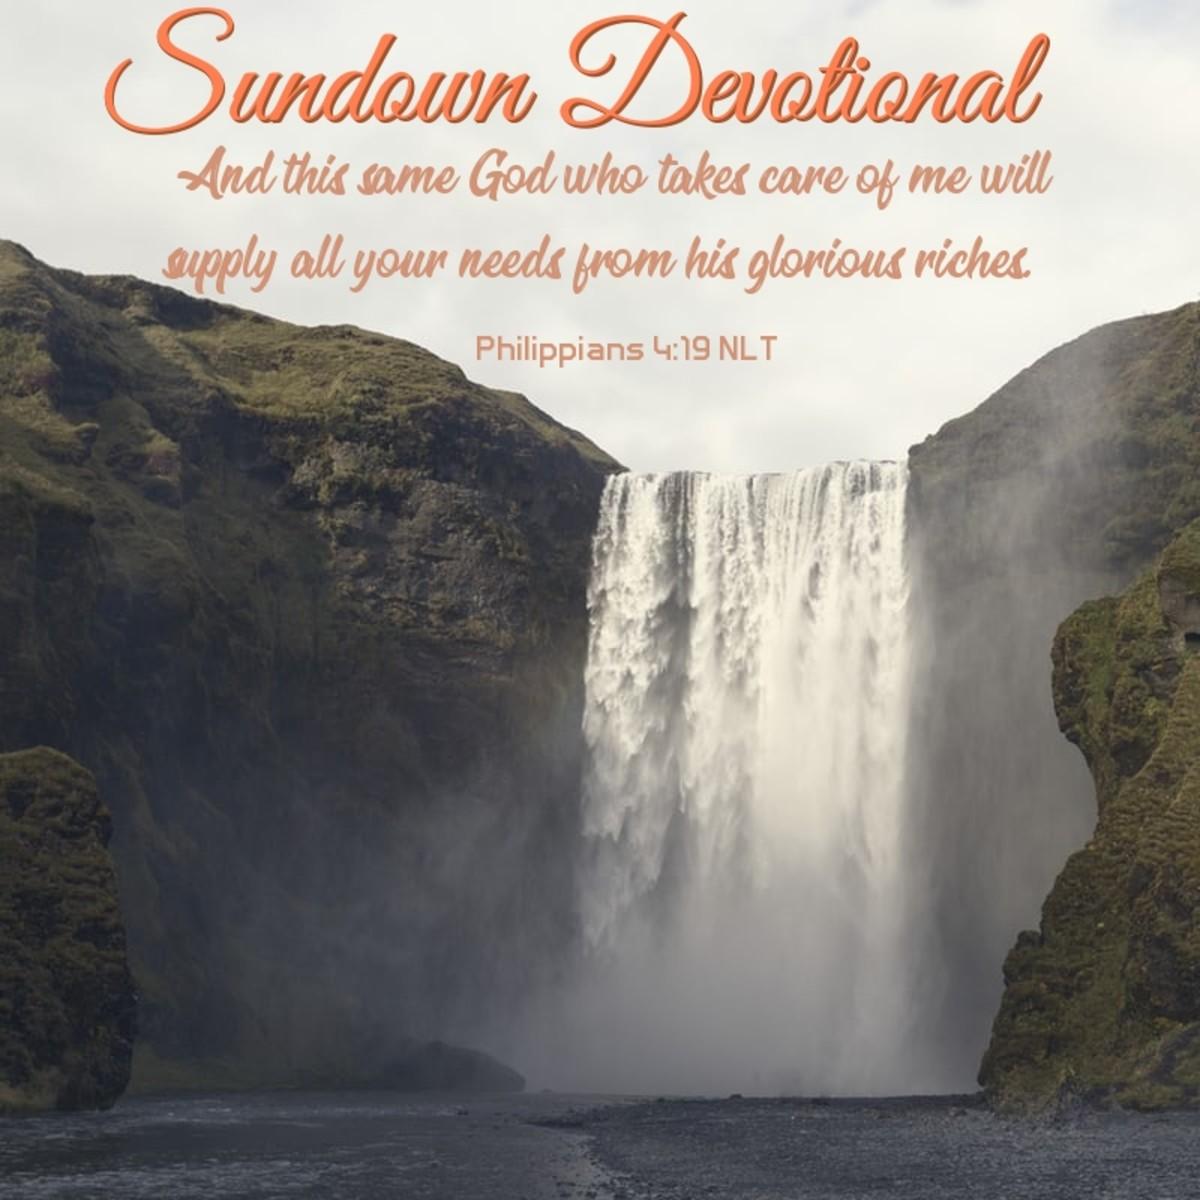 Sundown Devotional: God Provides According to His Riches